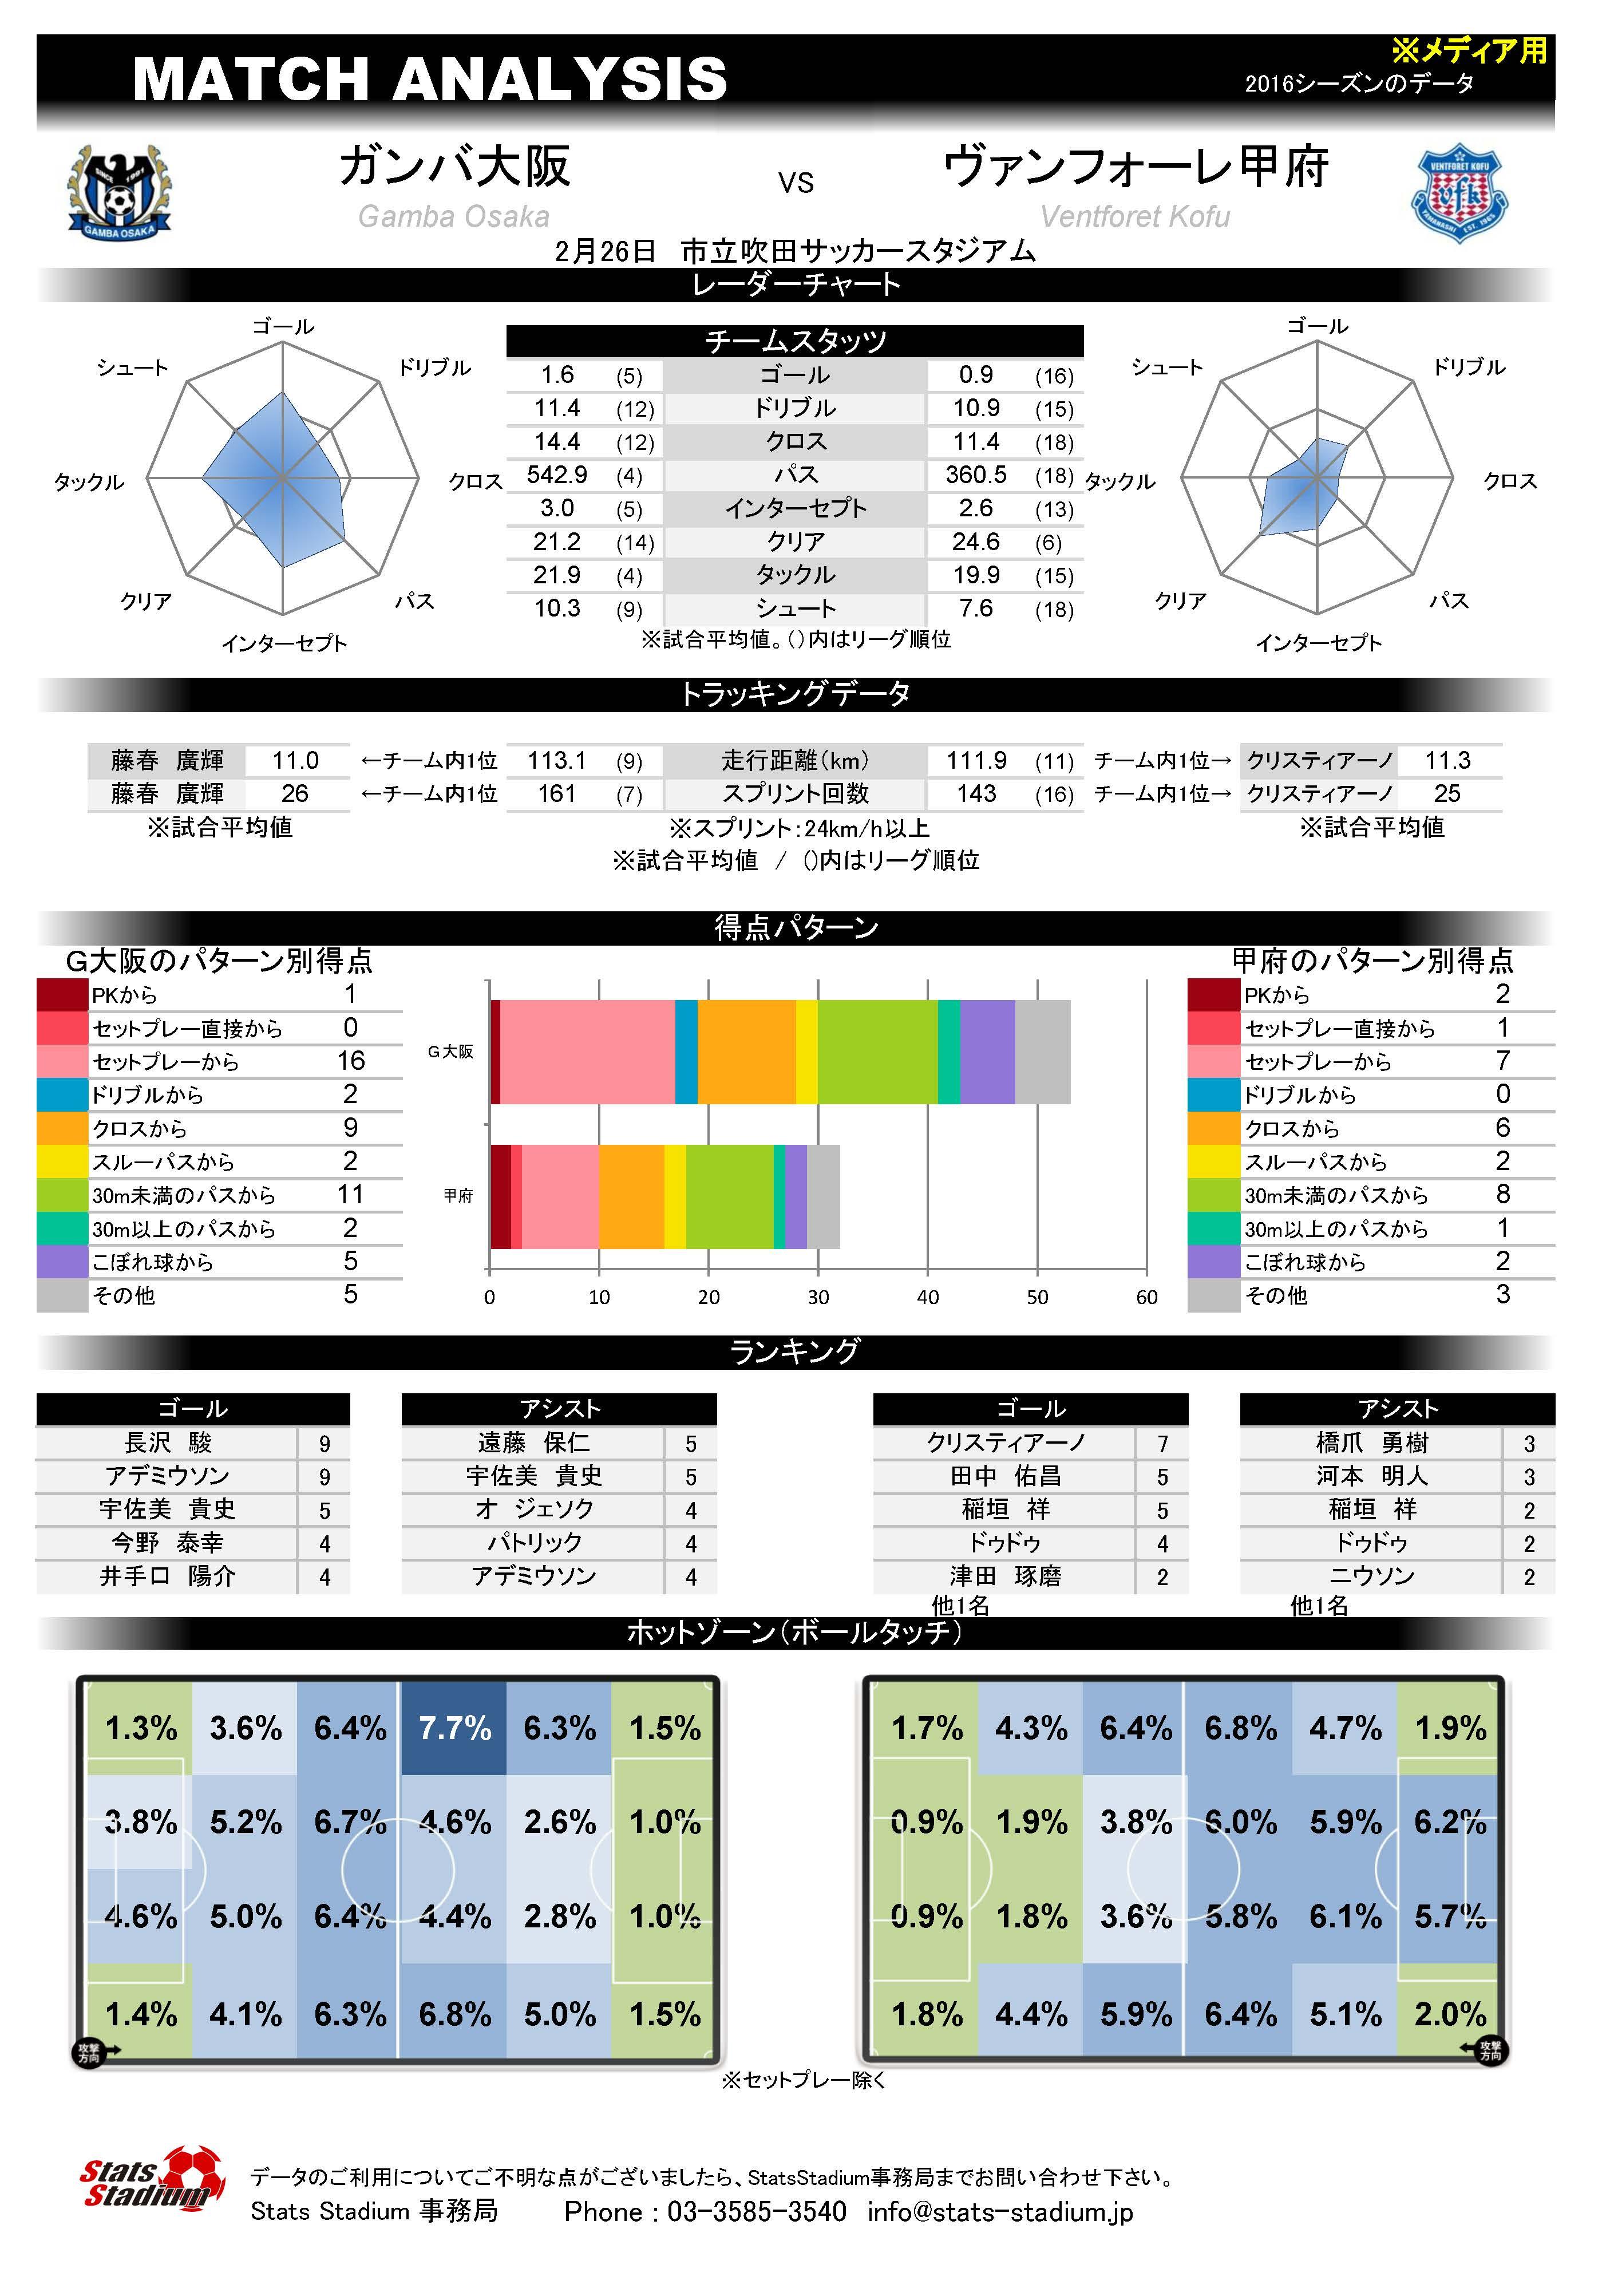 http://www.jleague.jp/img/opening-game/2017/infographics/gosaka-kofu.jpg